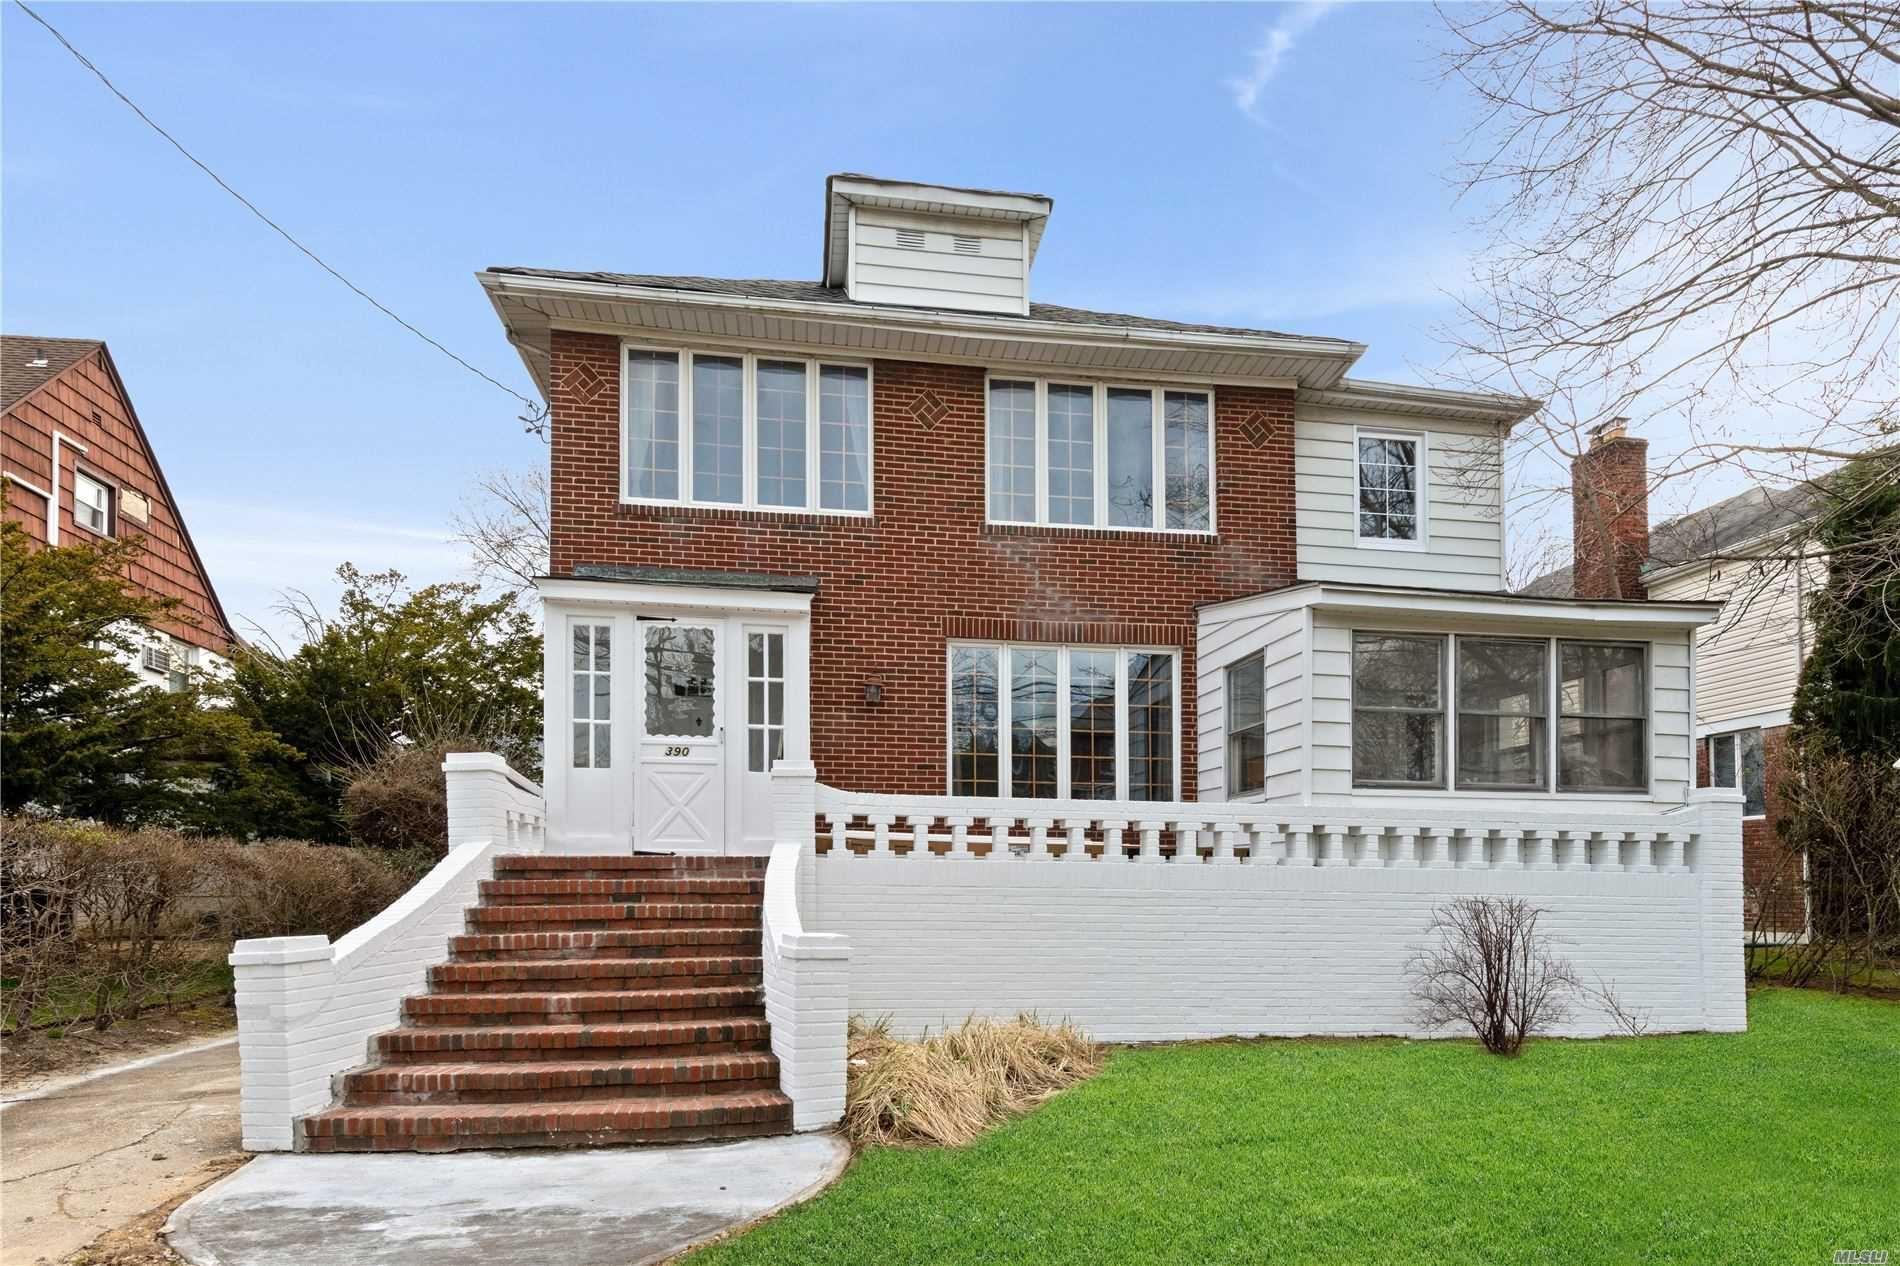 390 Eastwood Road, Woodmere, NY 11598 - MLS#: 3207470